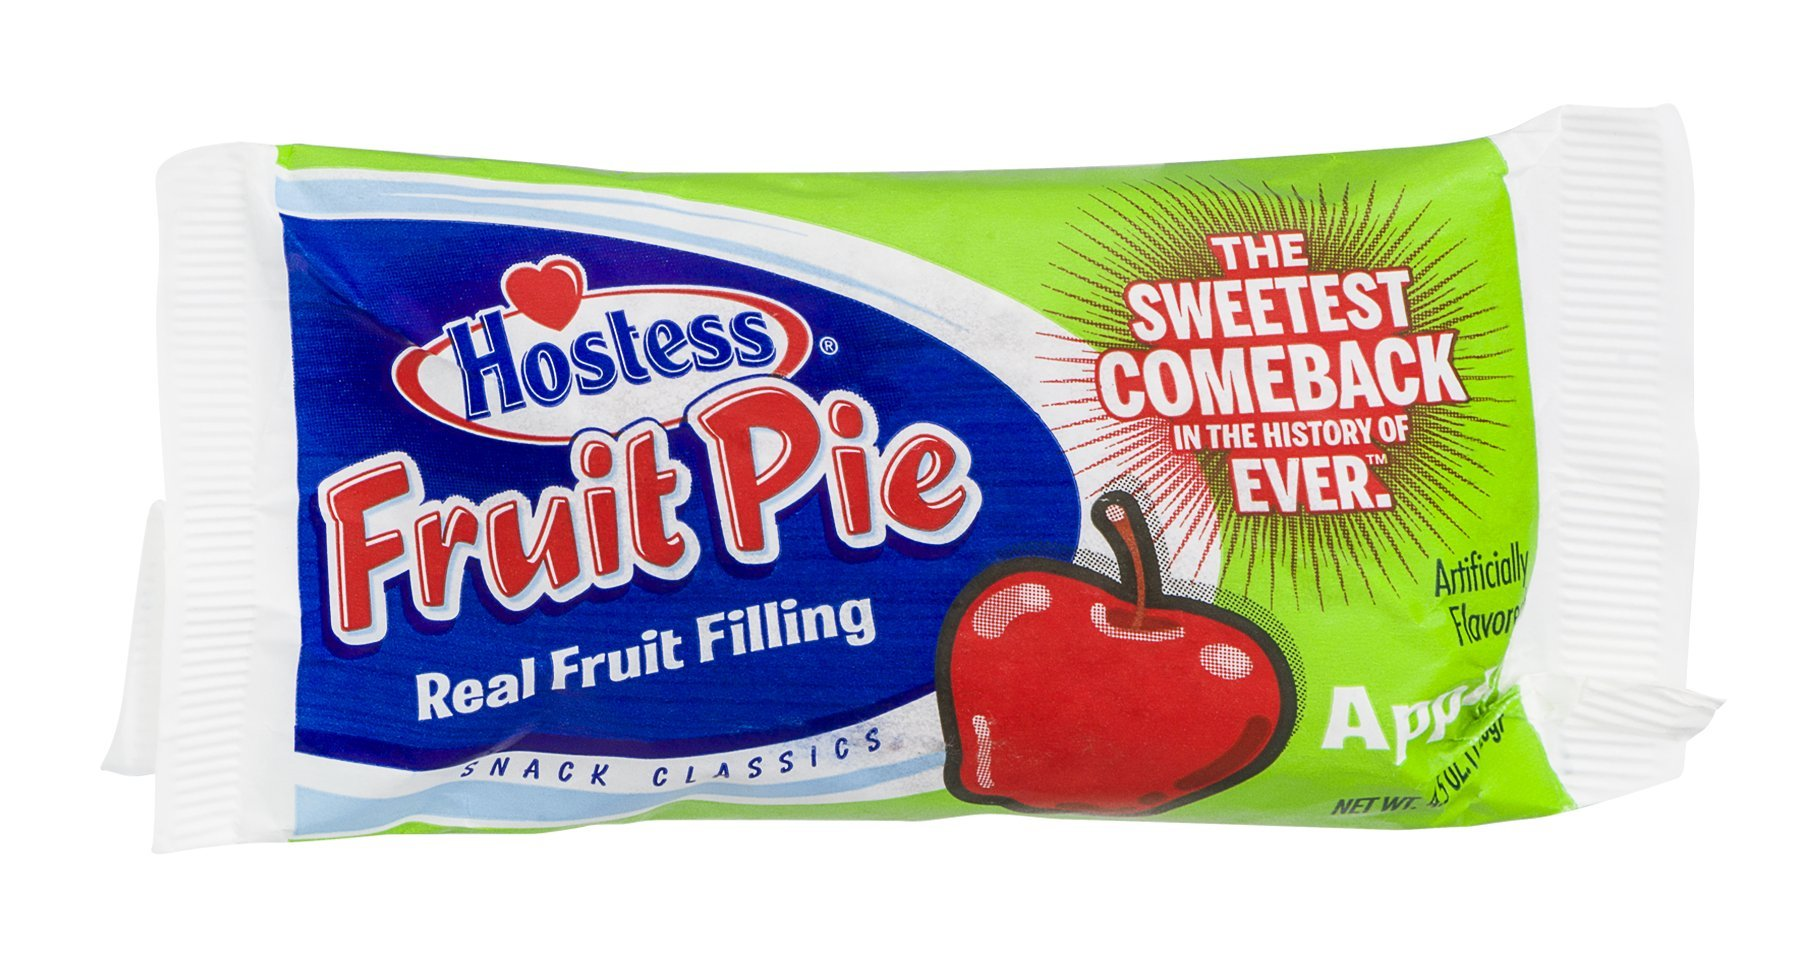 Hostess Fruit Pie Apple 4.5 OZ (Pack of 36) by Hostess